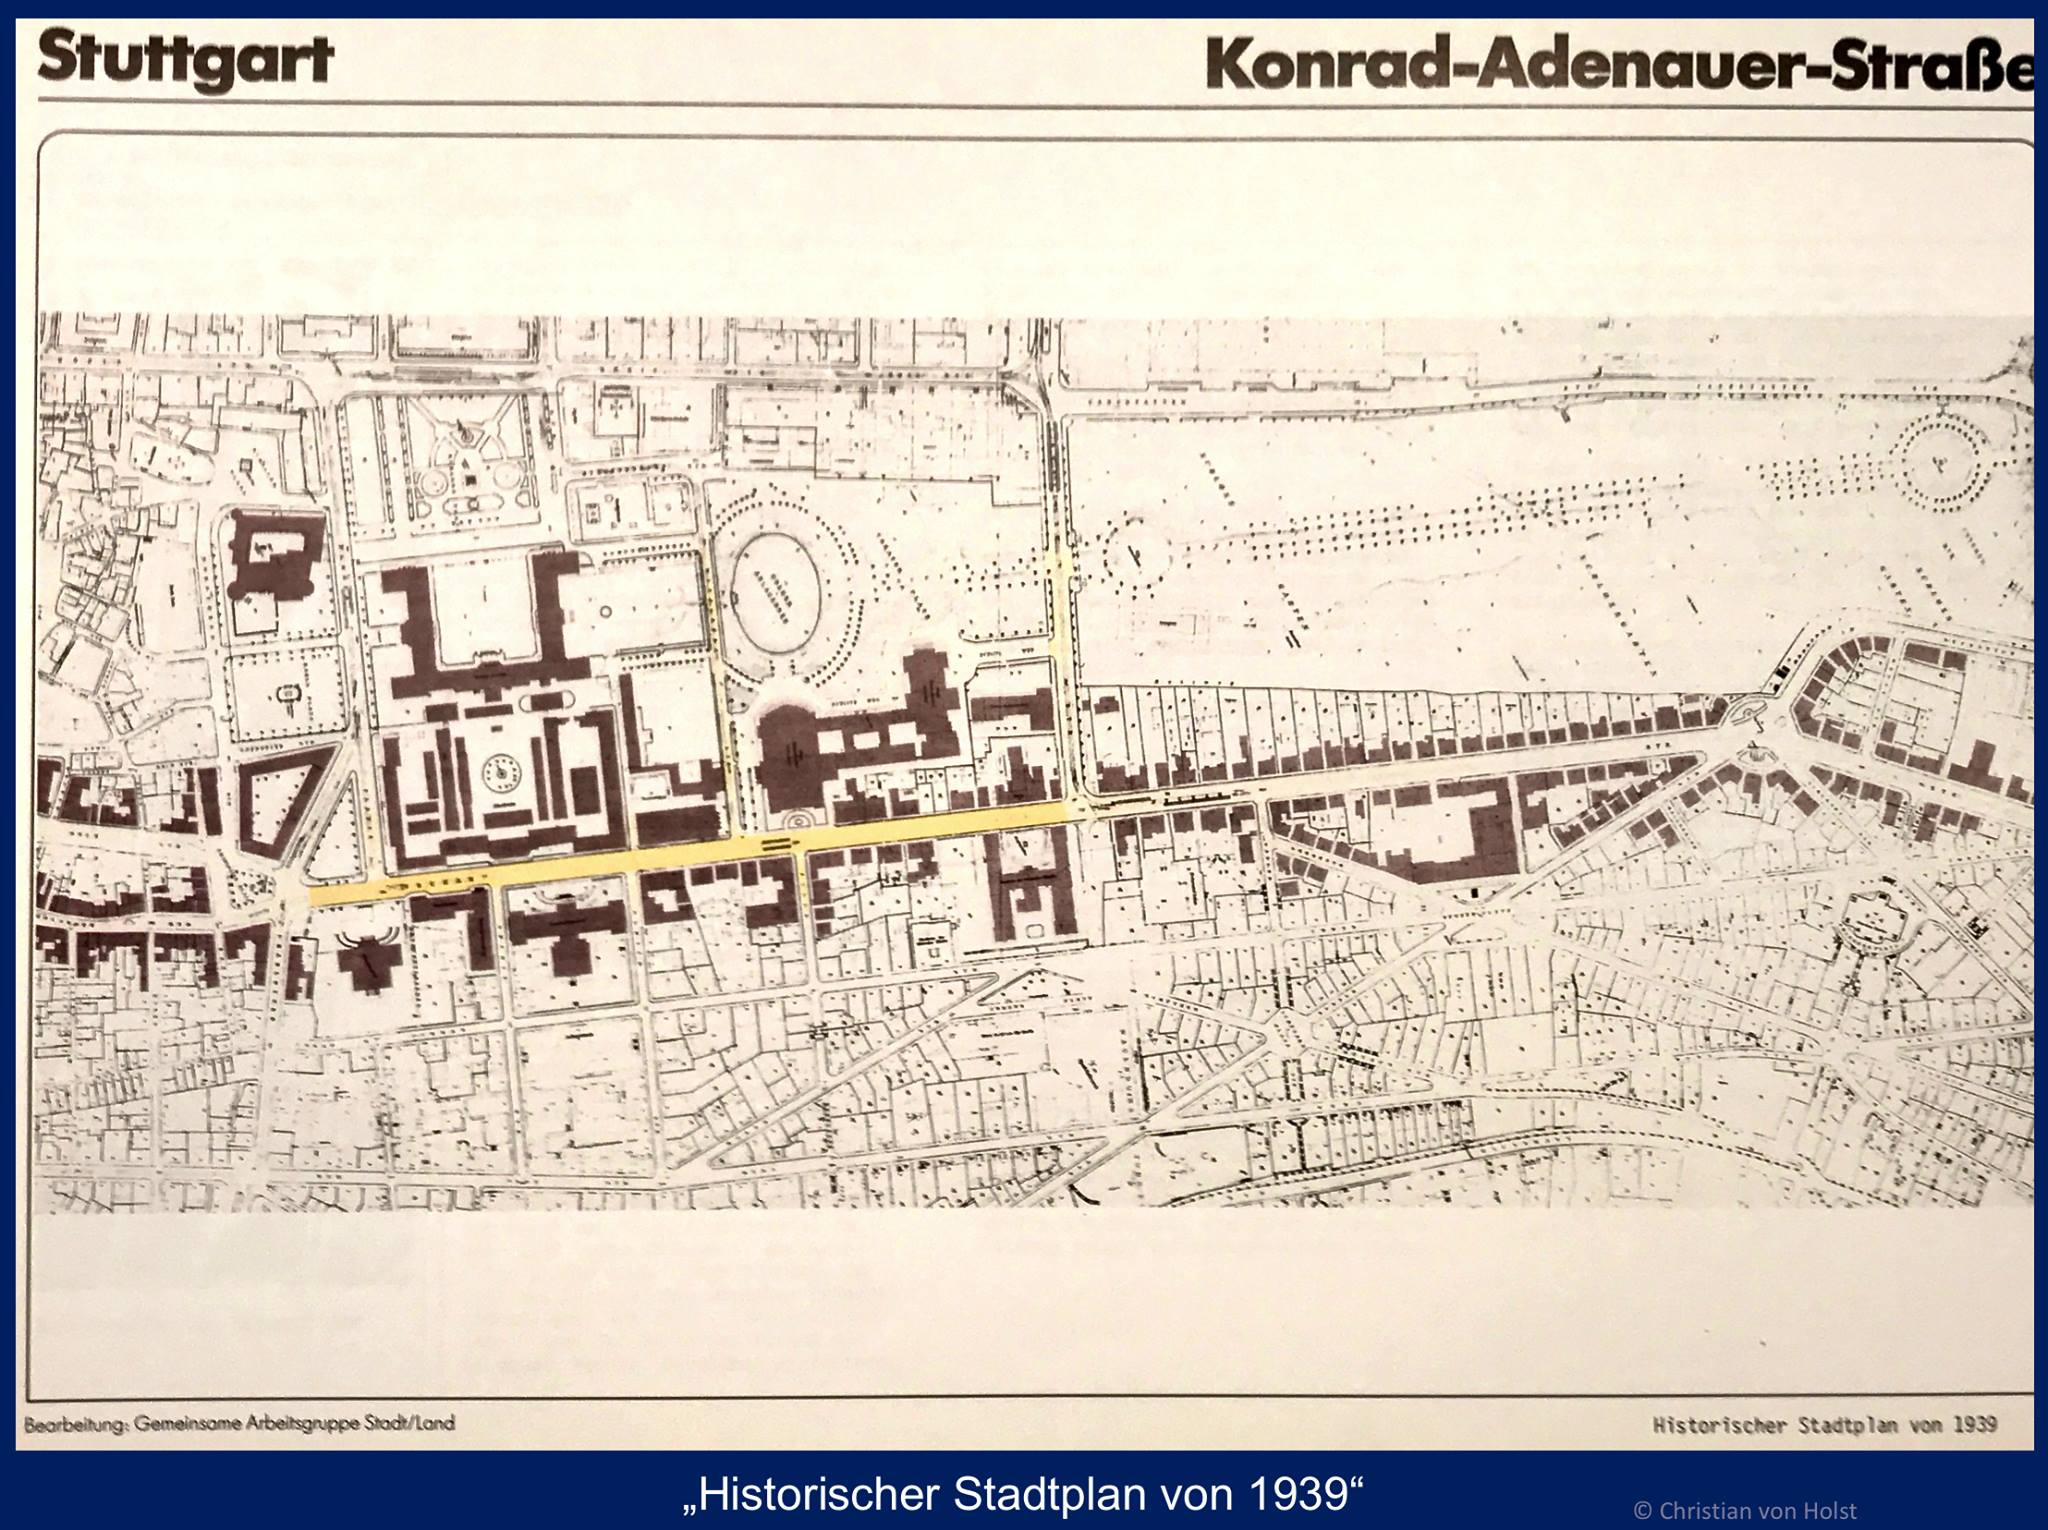 Ovalsee: Nikolaus Thouret, 1850-1941 – noch im Stadtplan 1939 erhalten